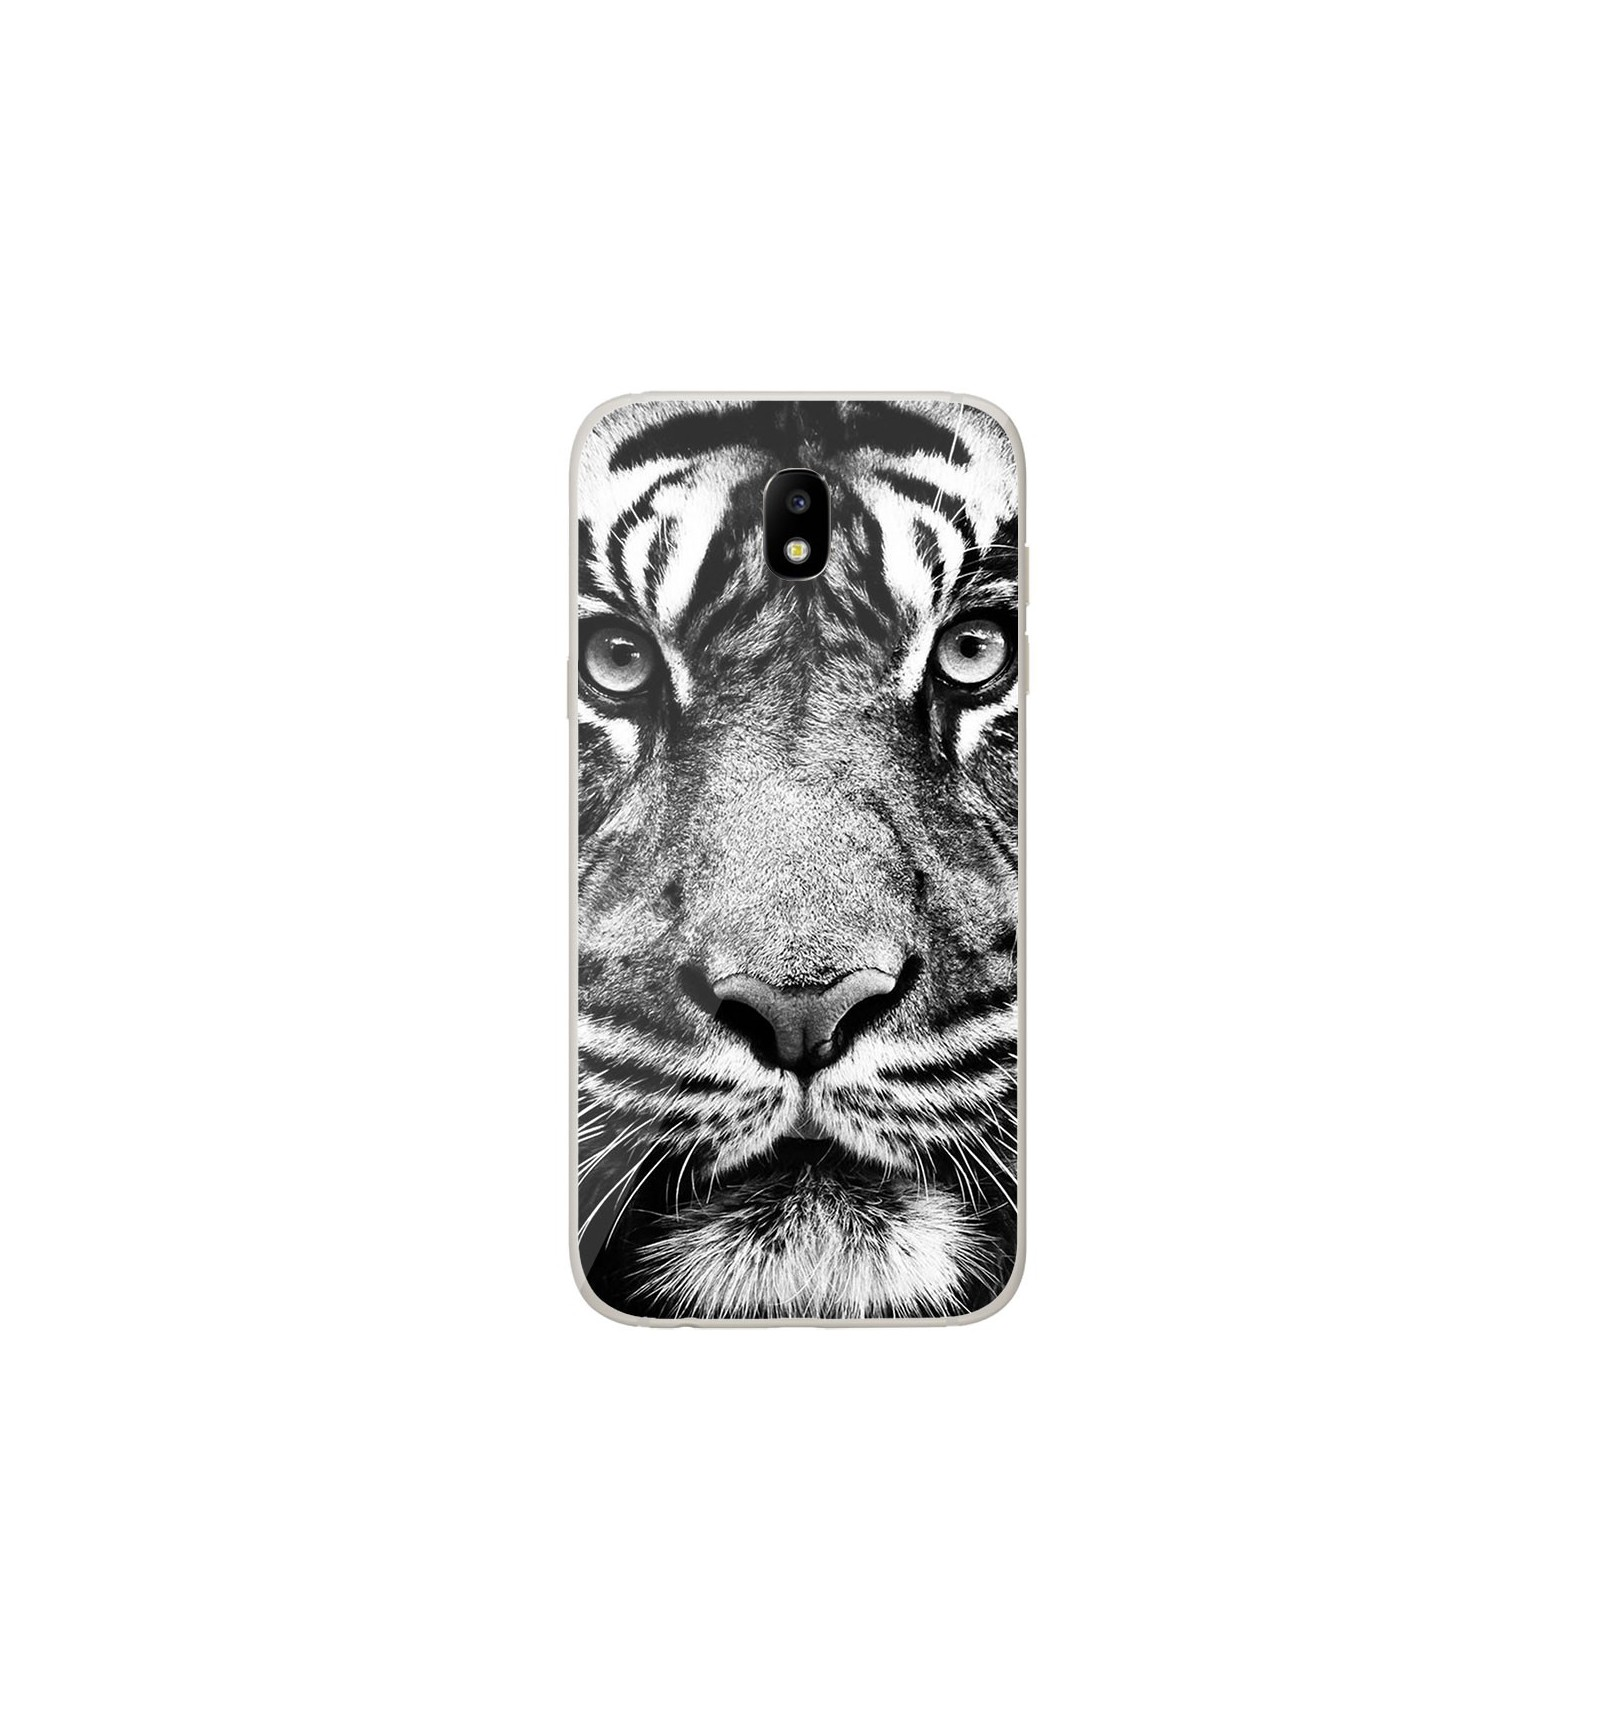 coque en silicone samsung galaxy j5 2017 tigre blanc et noir. Black Bedroom Furniture Sets. Home Design Ideas